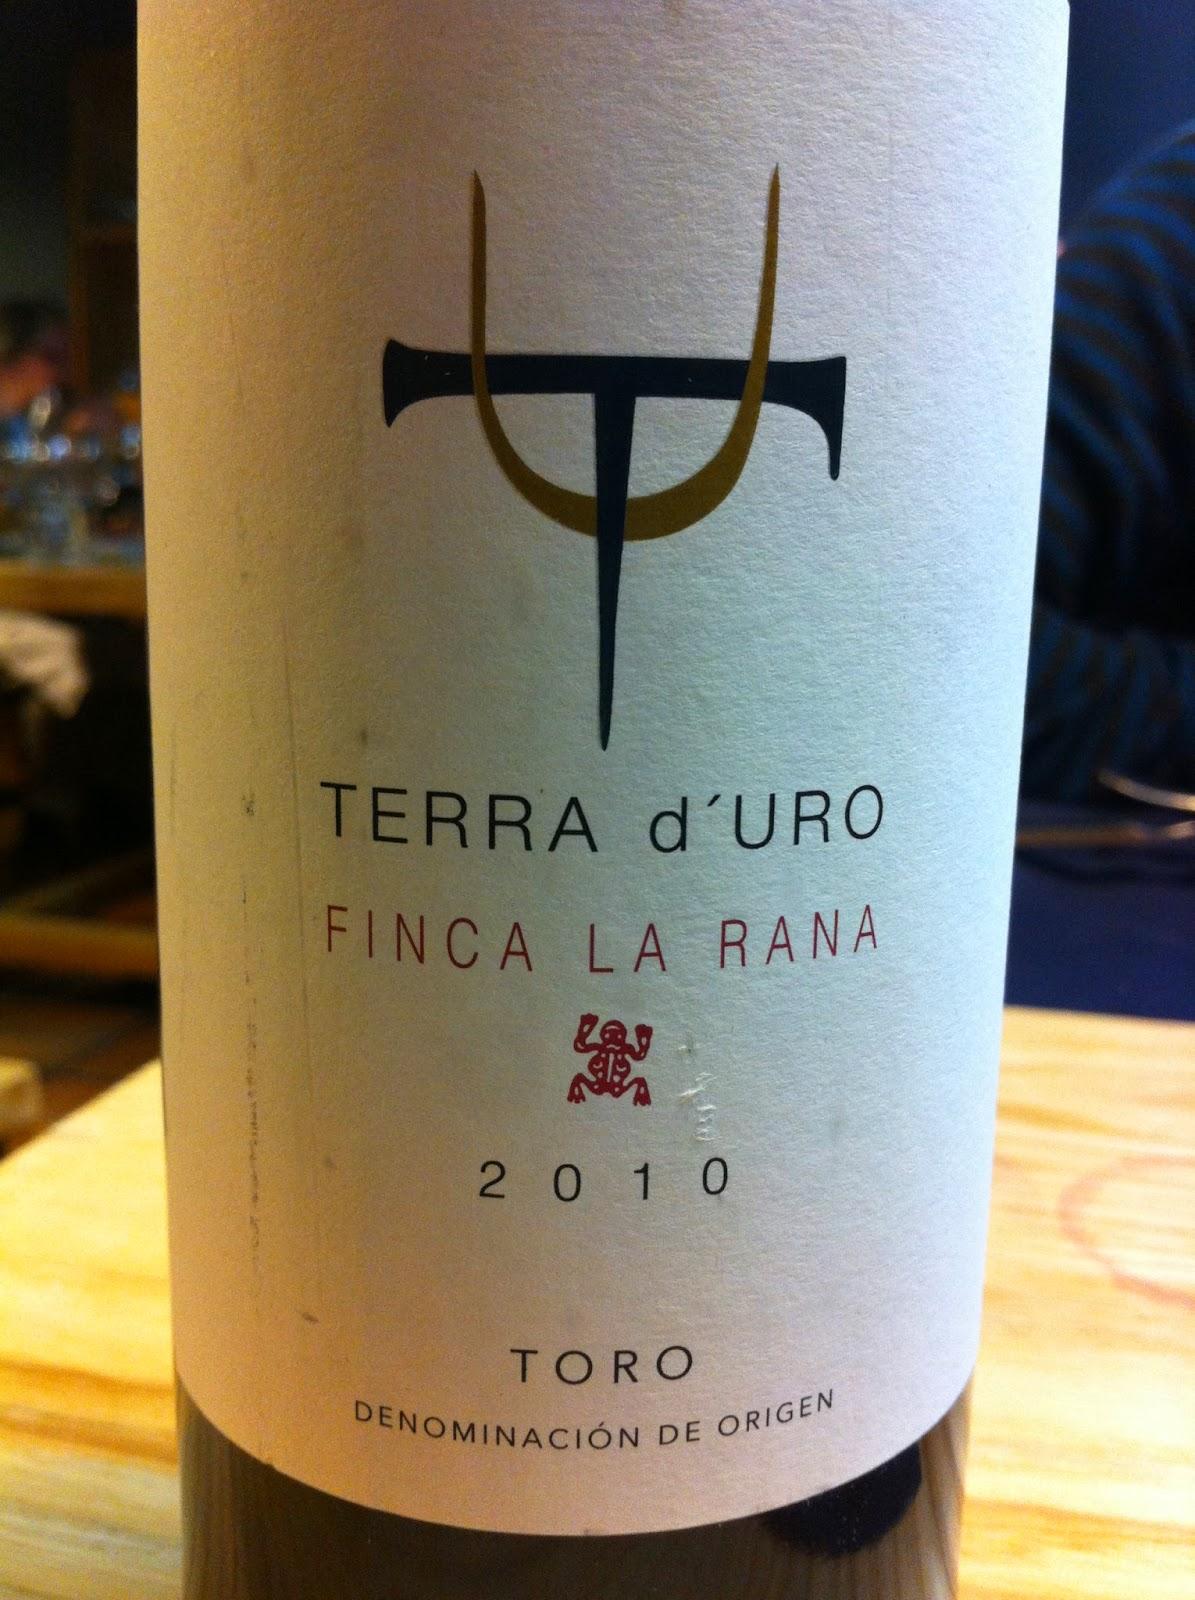 Terra-d'uro-finca-la-rana-2010-toro-tinto